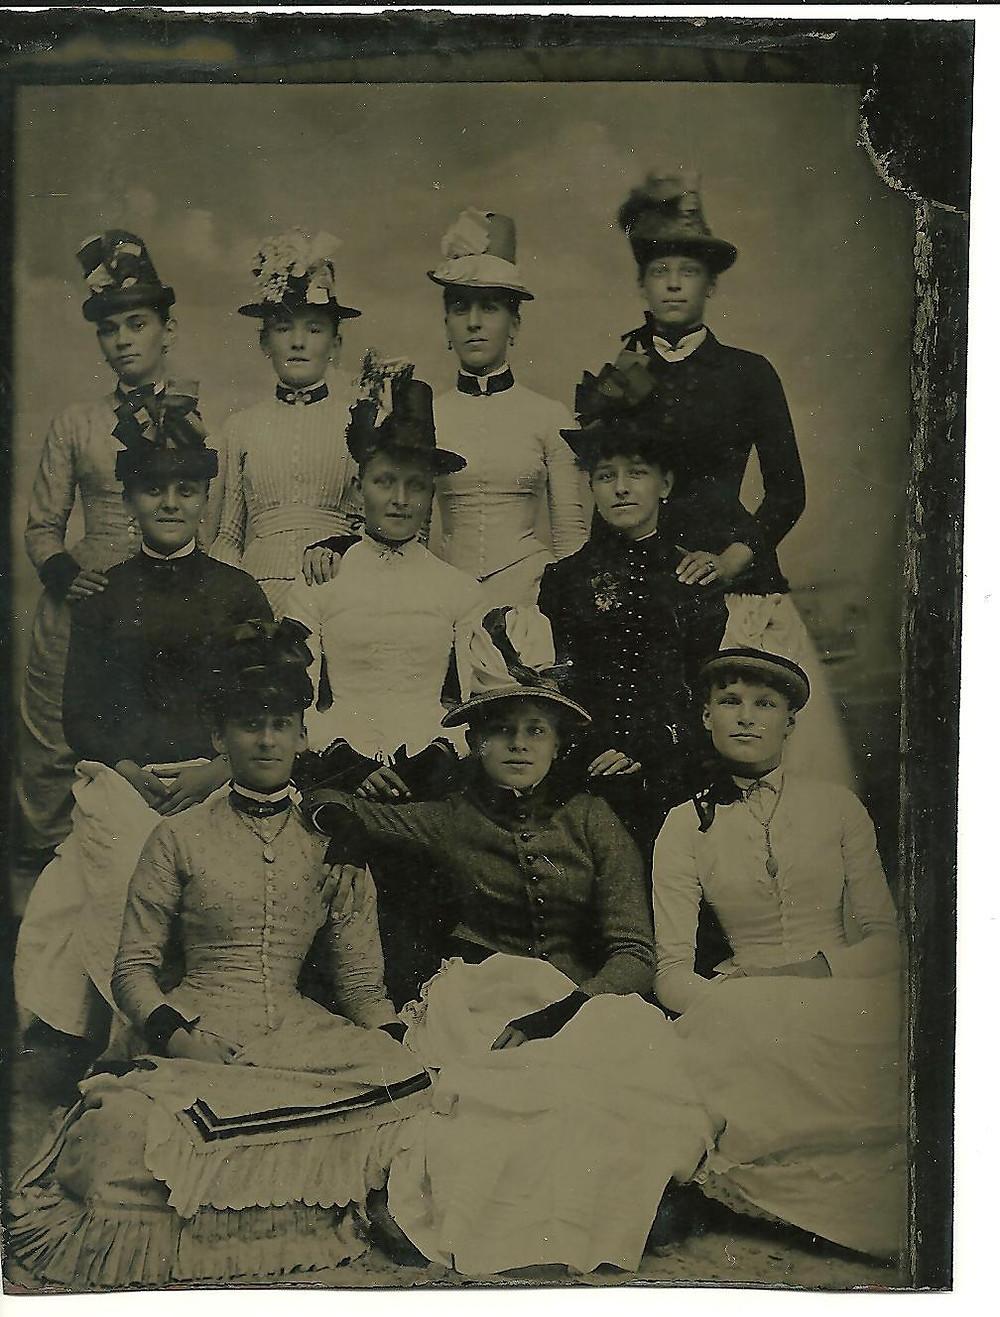 Tintype, Rockaway, 1887